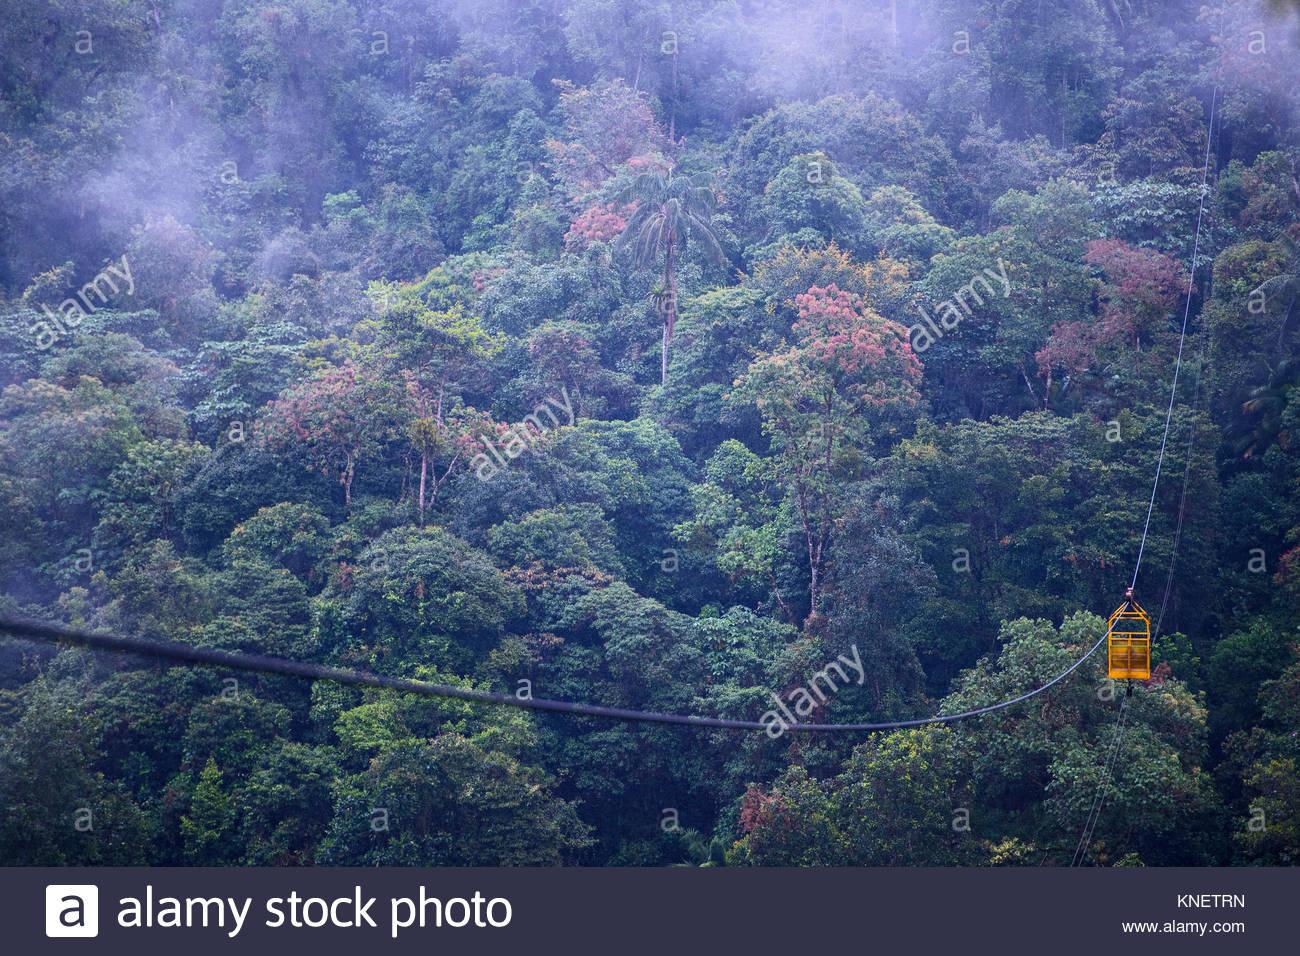 Cable car at the rainforest in Mindo, close to the equator, Mindo, Pichincha, Ecuador, South America - Stock Image